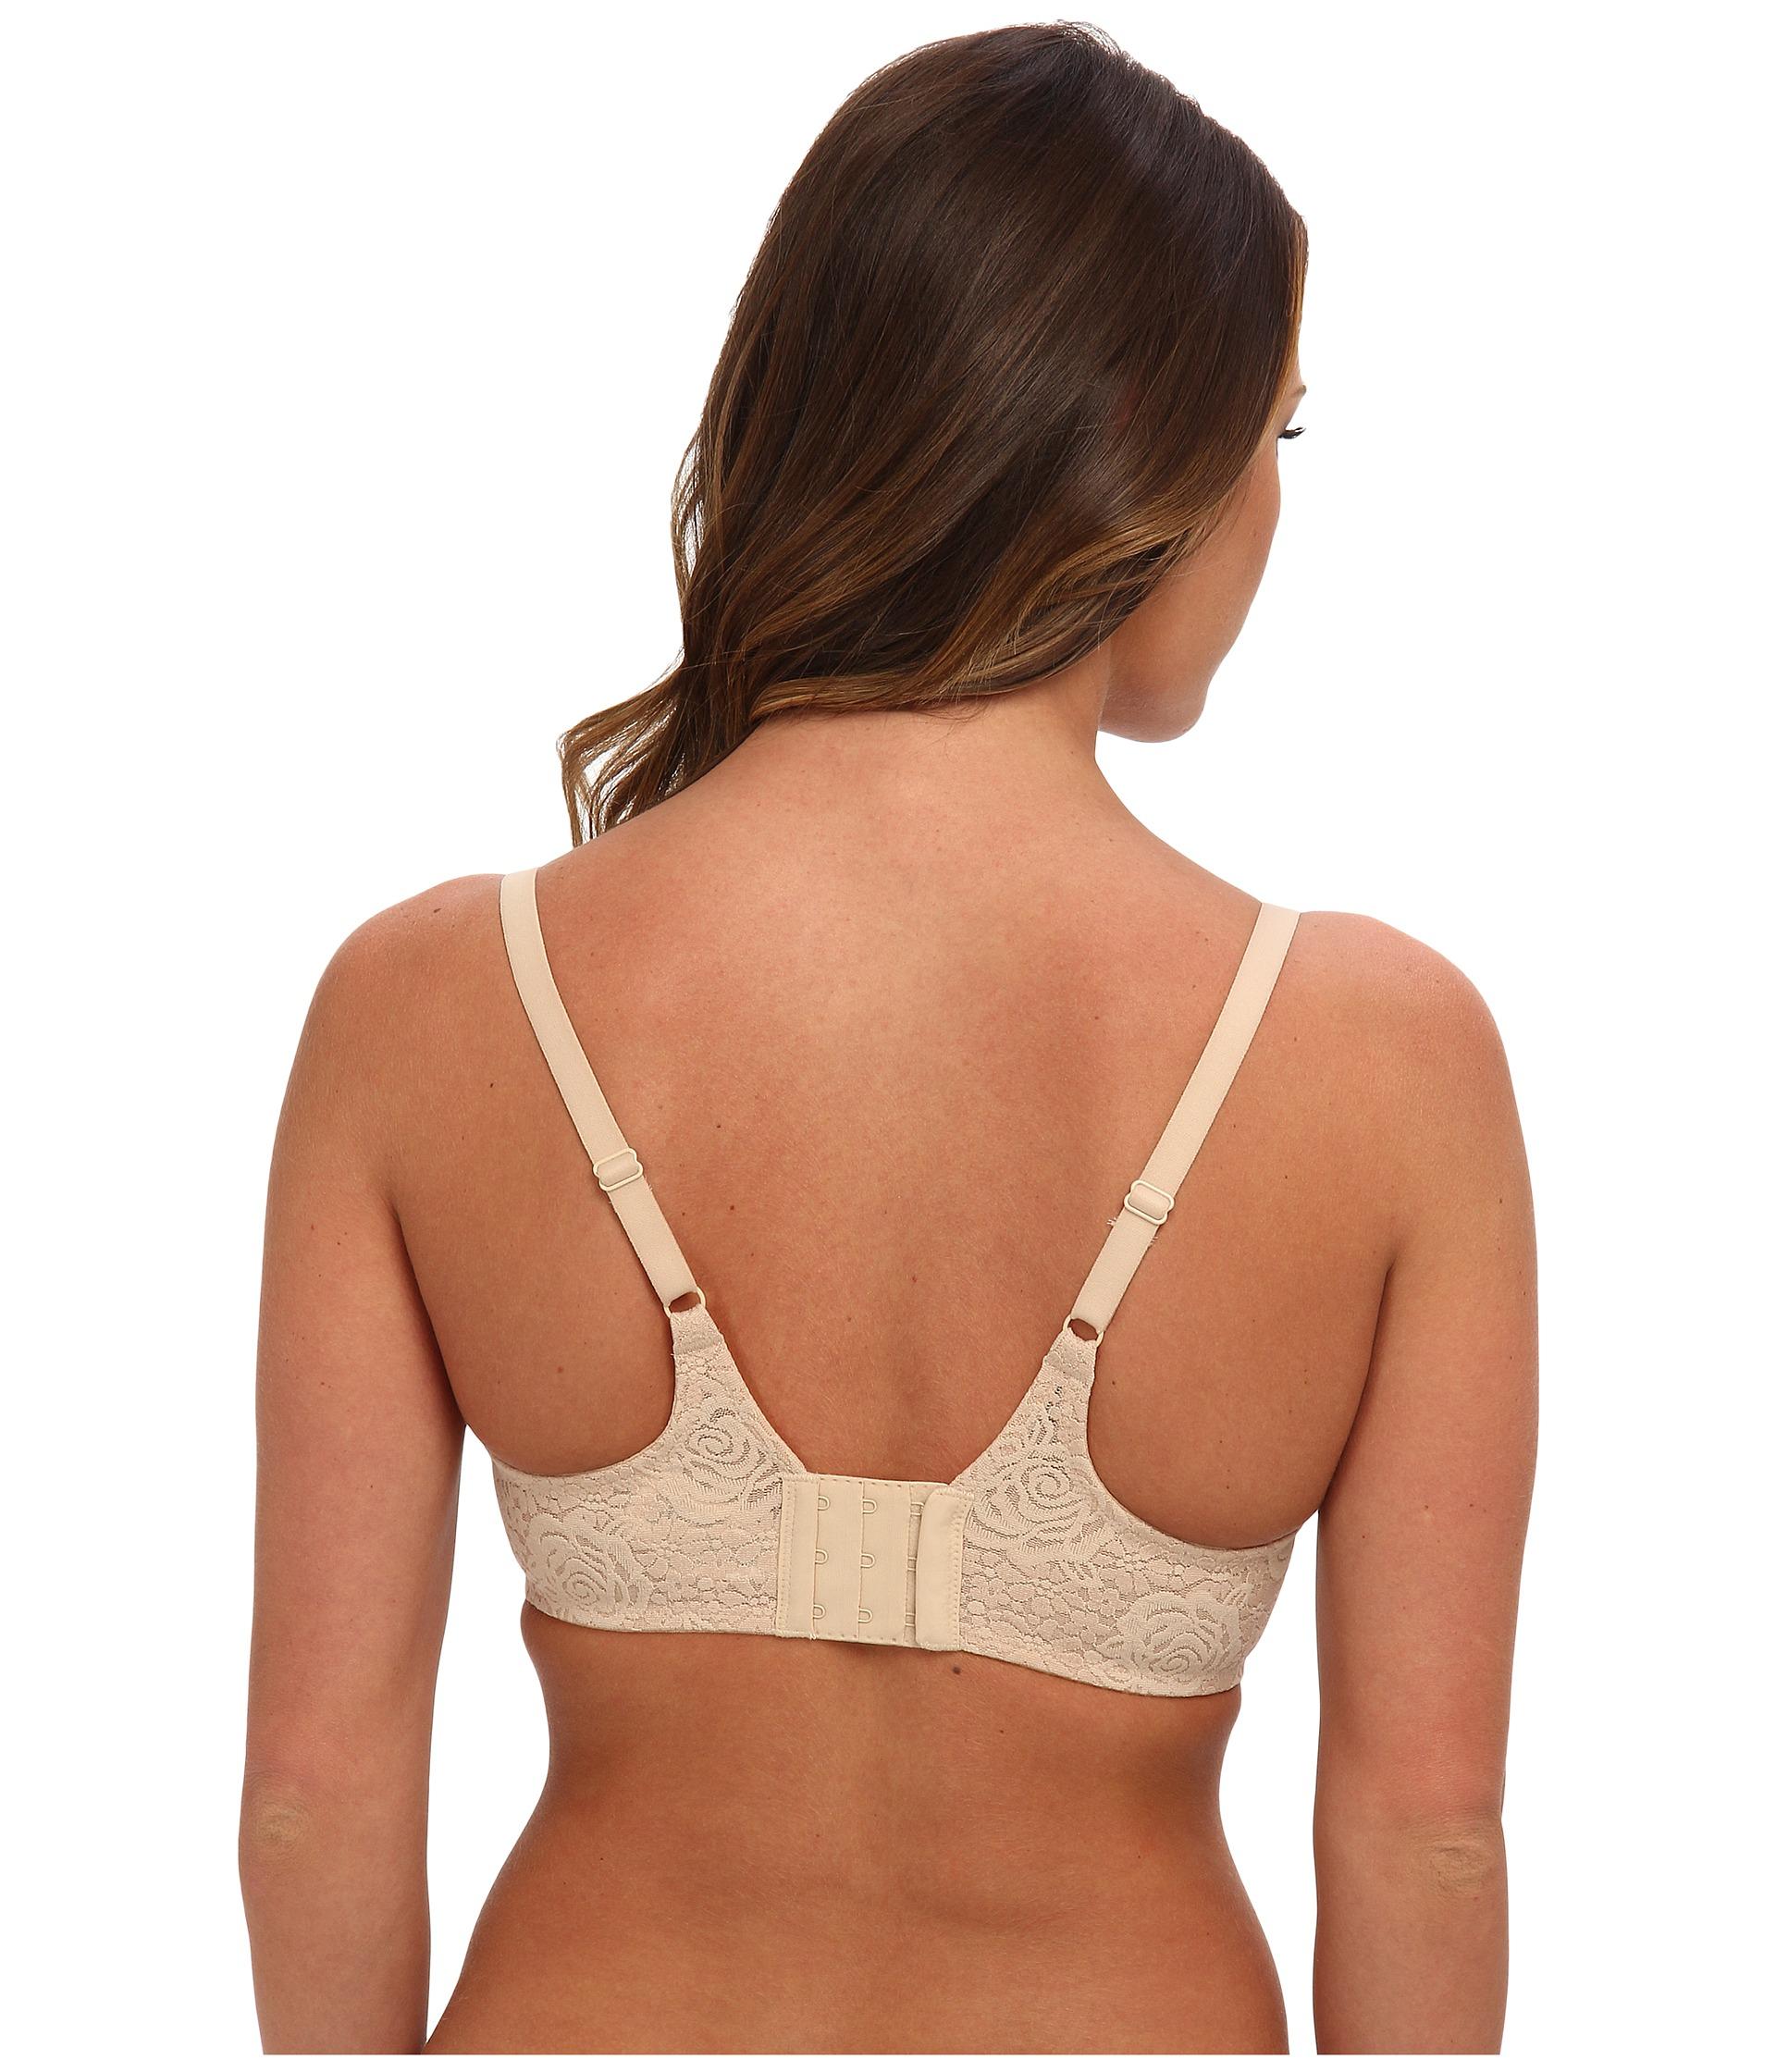 how to fix underwire bra without moleskin